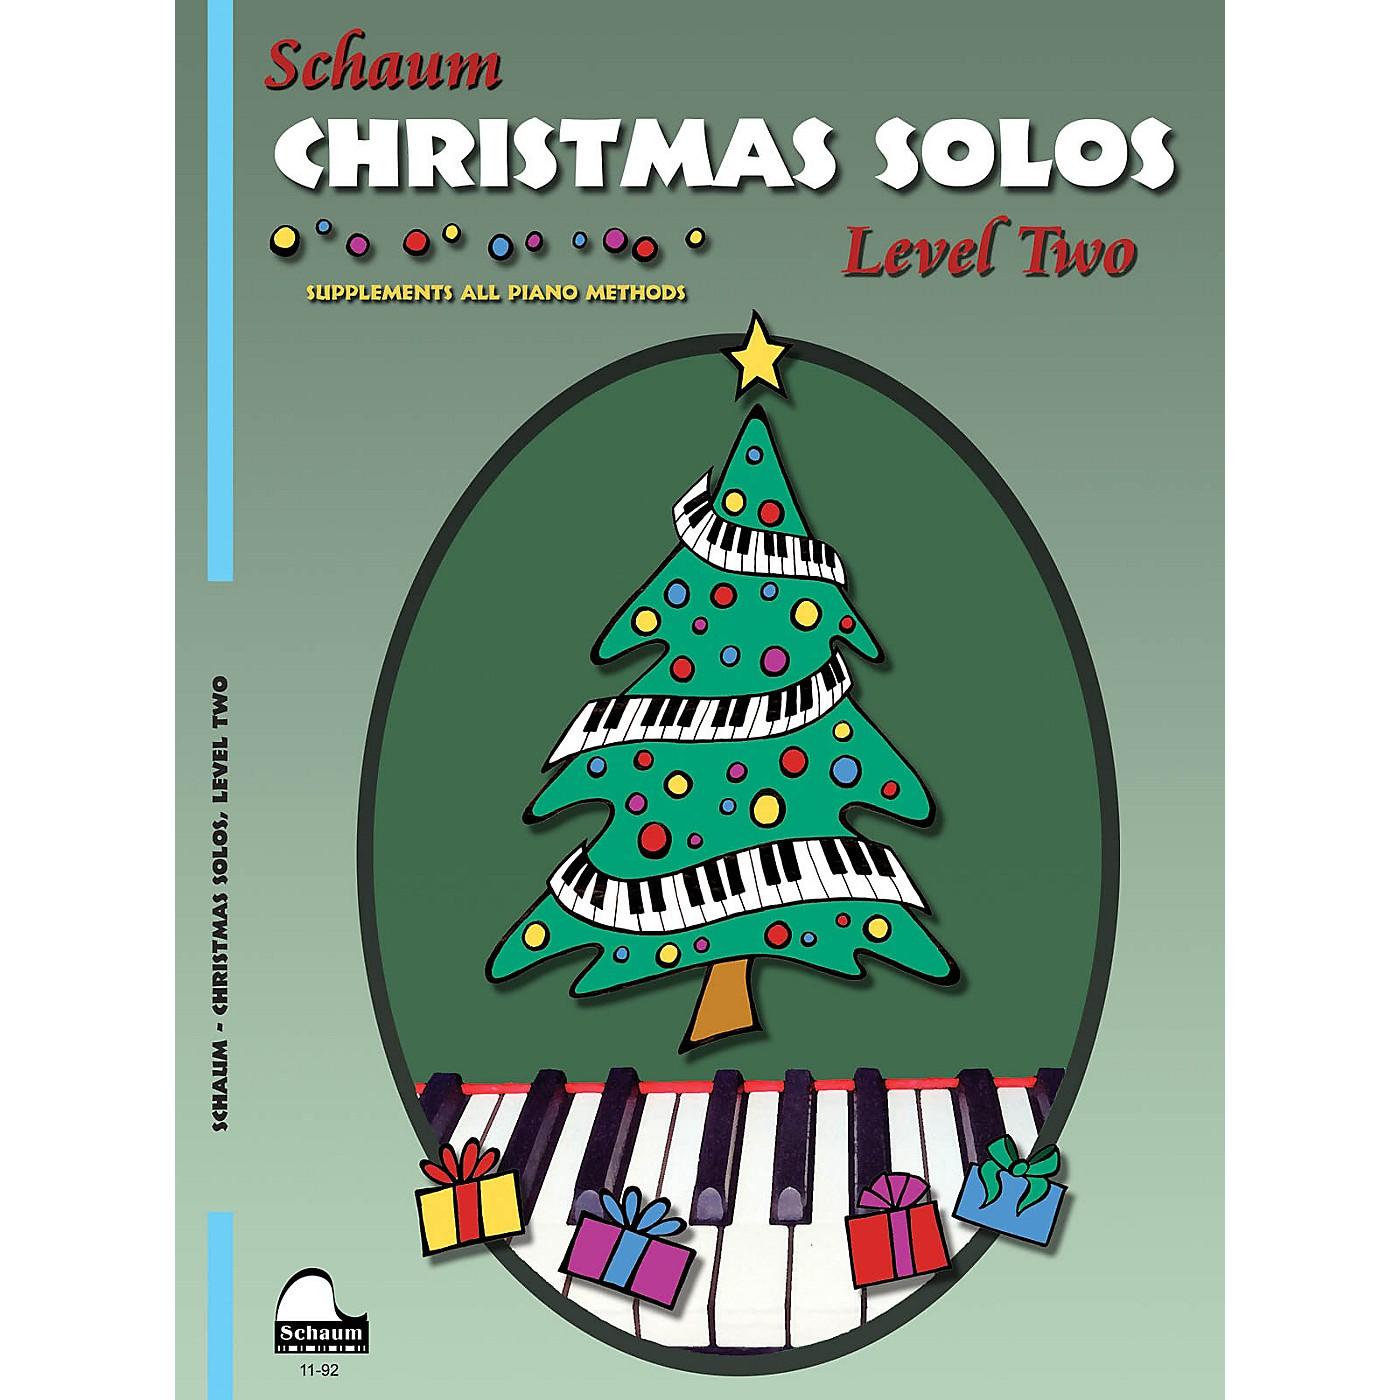 SCHAUM Christmas Solos (Level 2 Upper Elem Level) Educational Piano Book thumbnail